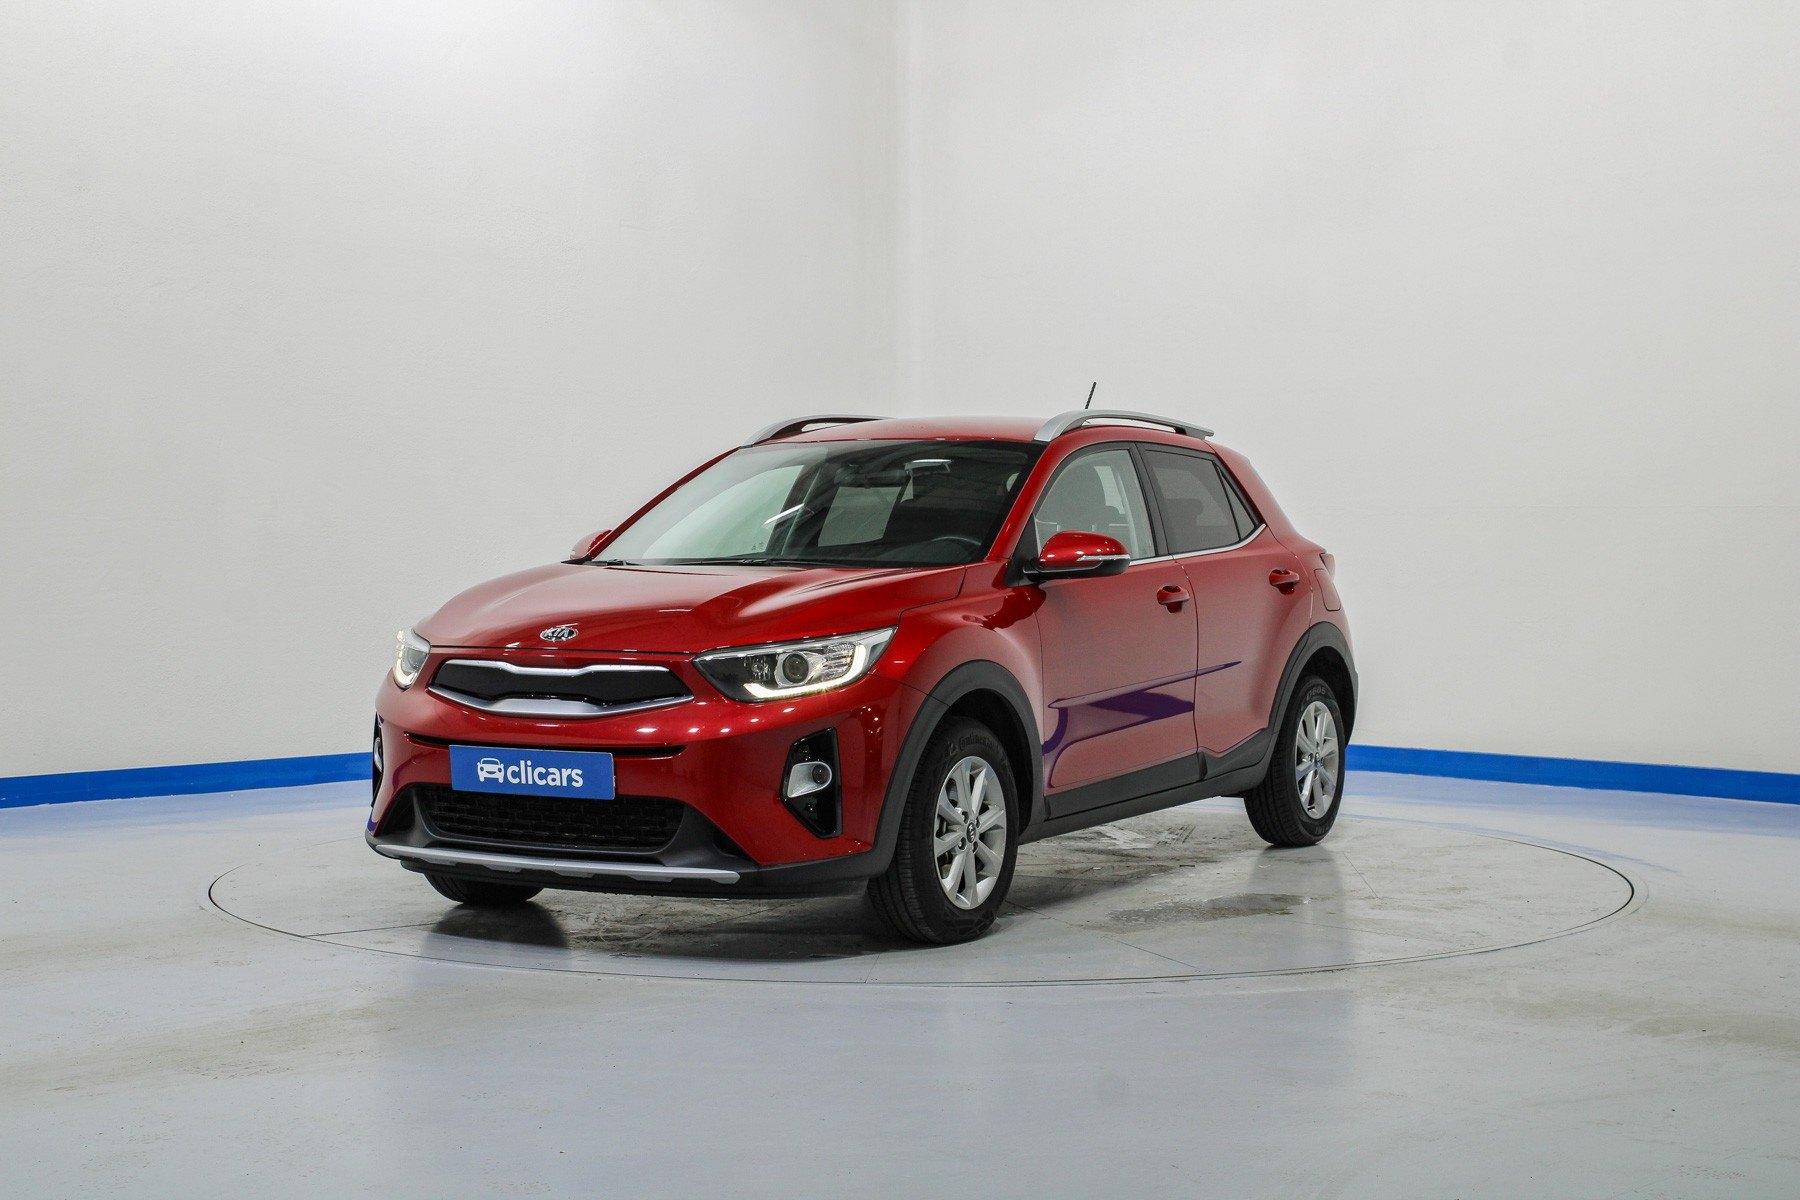 Kia Stonic Gasolina 1.2 CVVT 62kW (84CV) Drive Eco-Dynamics 1